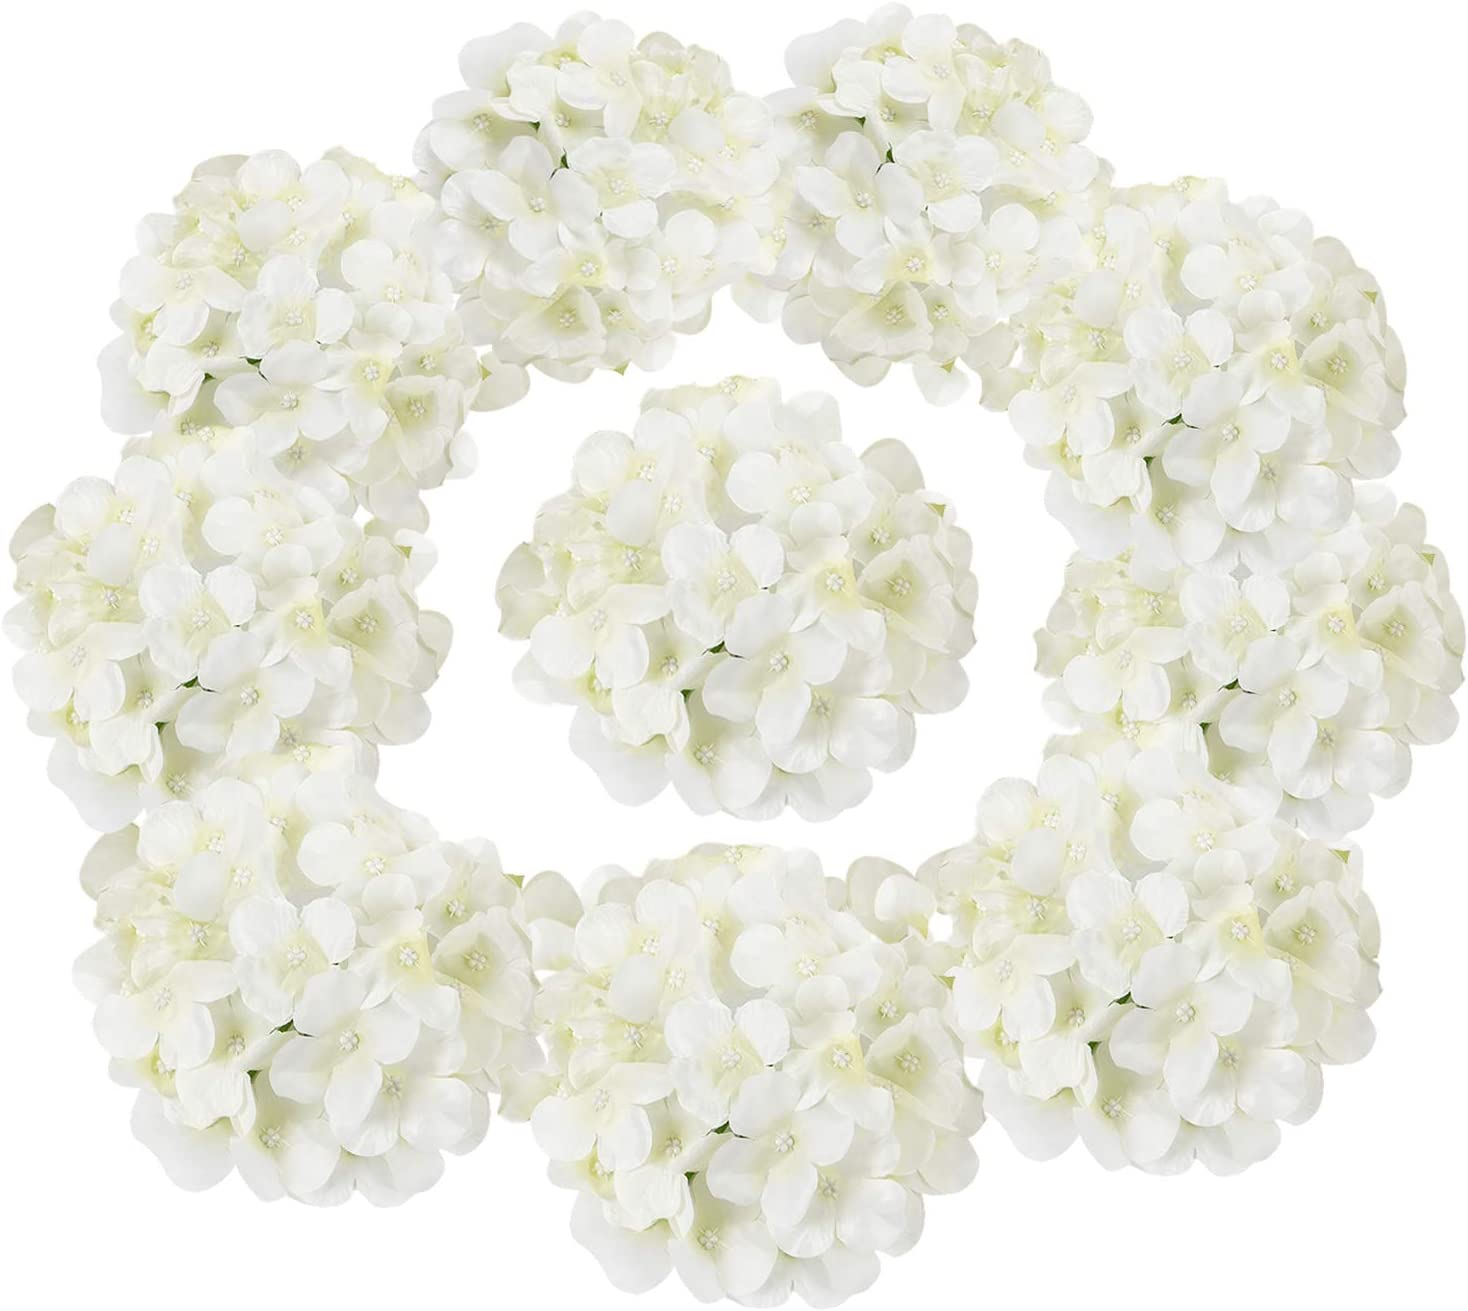 Sunm Boutique Artificial Hydrangea Flower Heads, 10 Pcs Silk Hydrangea Heads with Stems, Blooming Silk Hydrangea Flowers DIY Bouquet for Wedding Centerpieces Arrangements Party Home Decor